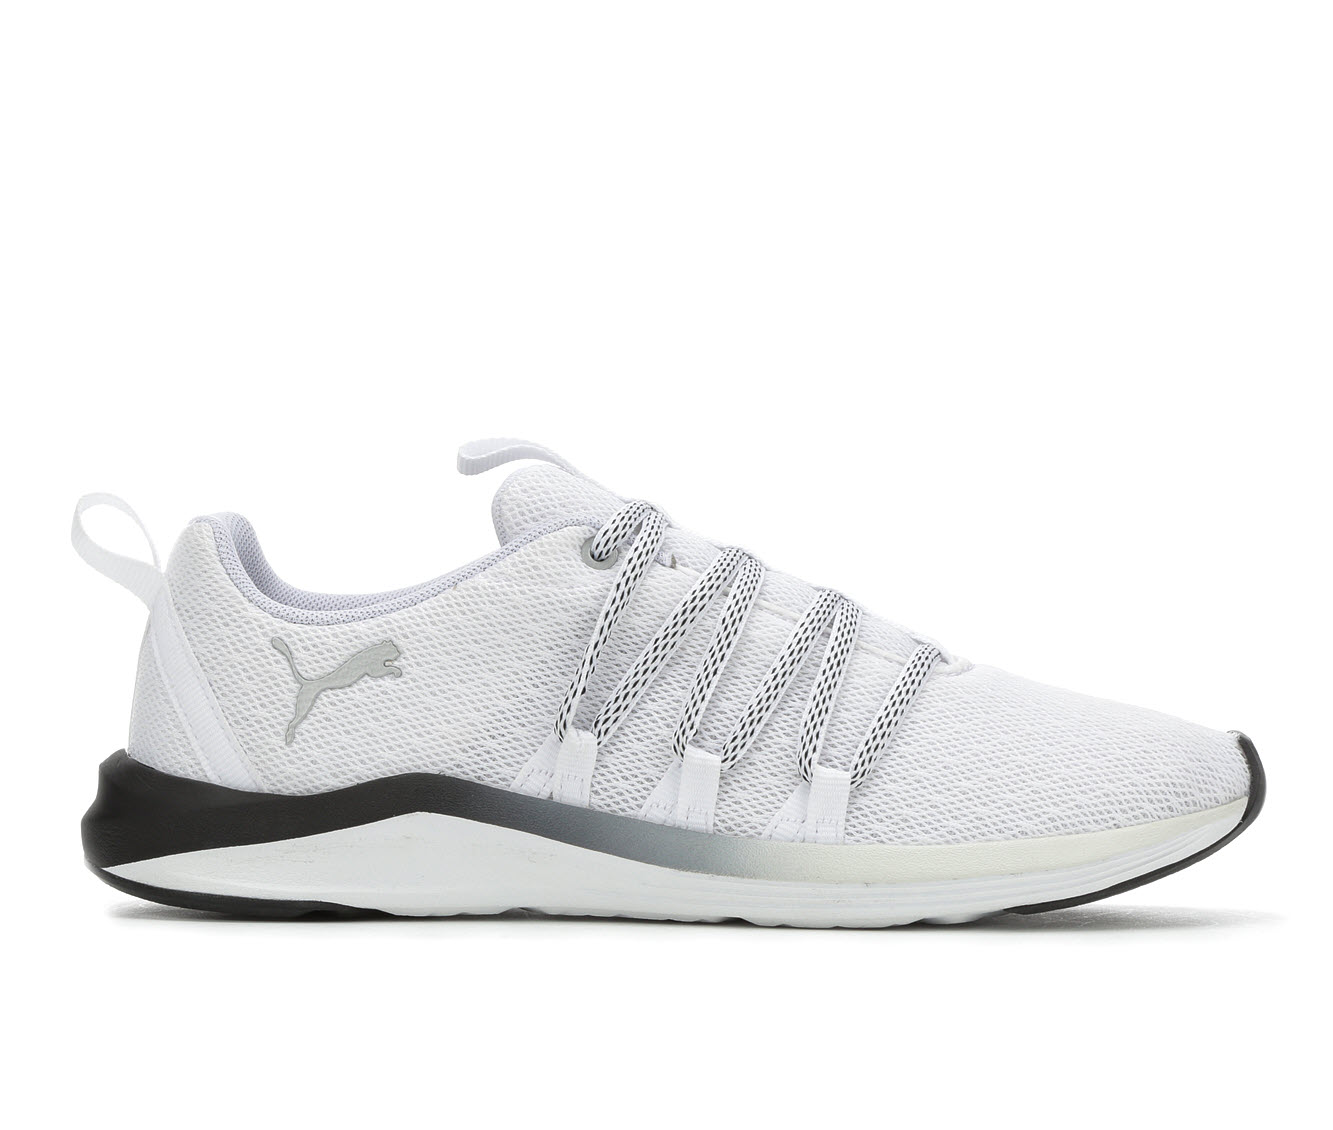 Puma Prowl Alt Fade Women's Athletic Shoe (White)